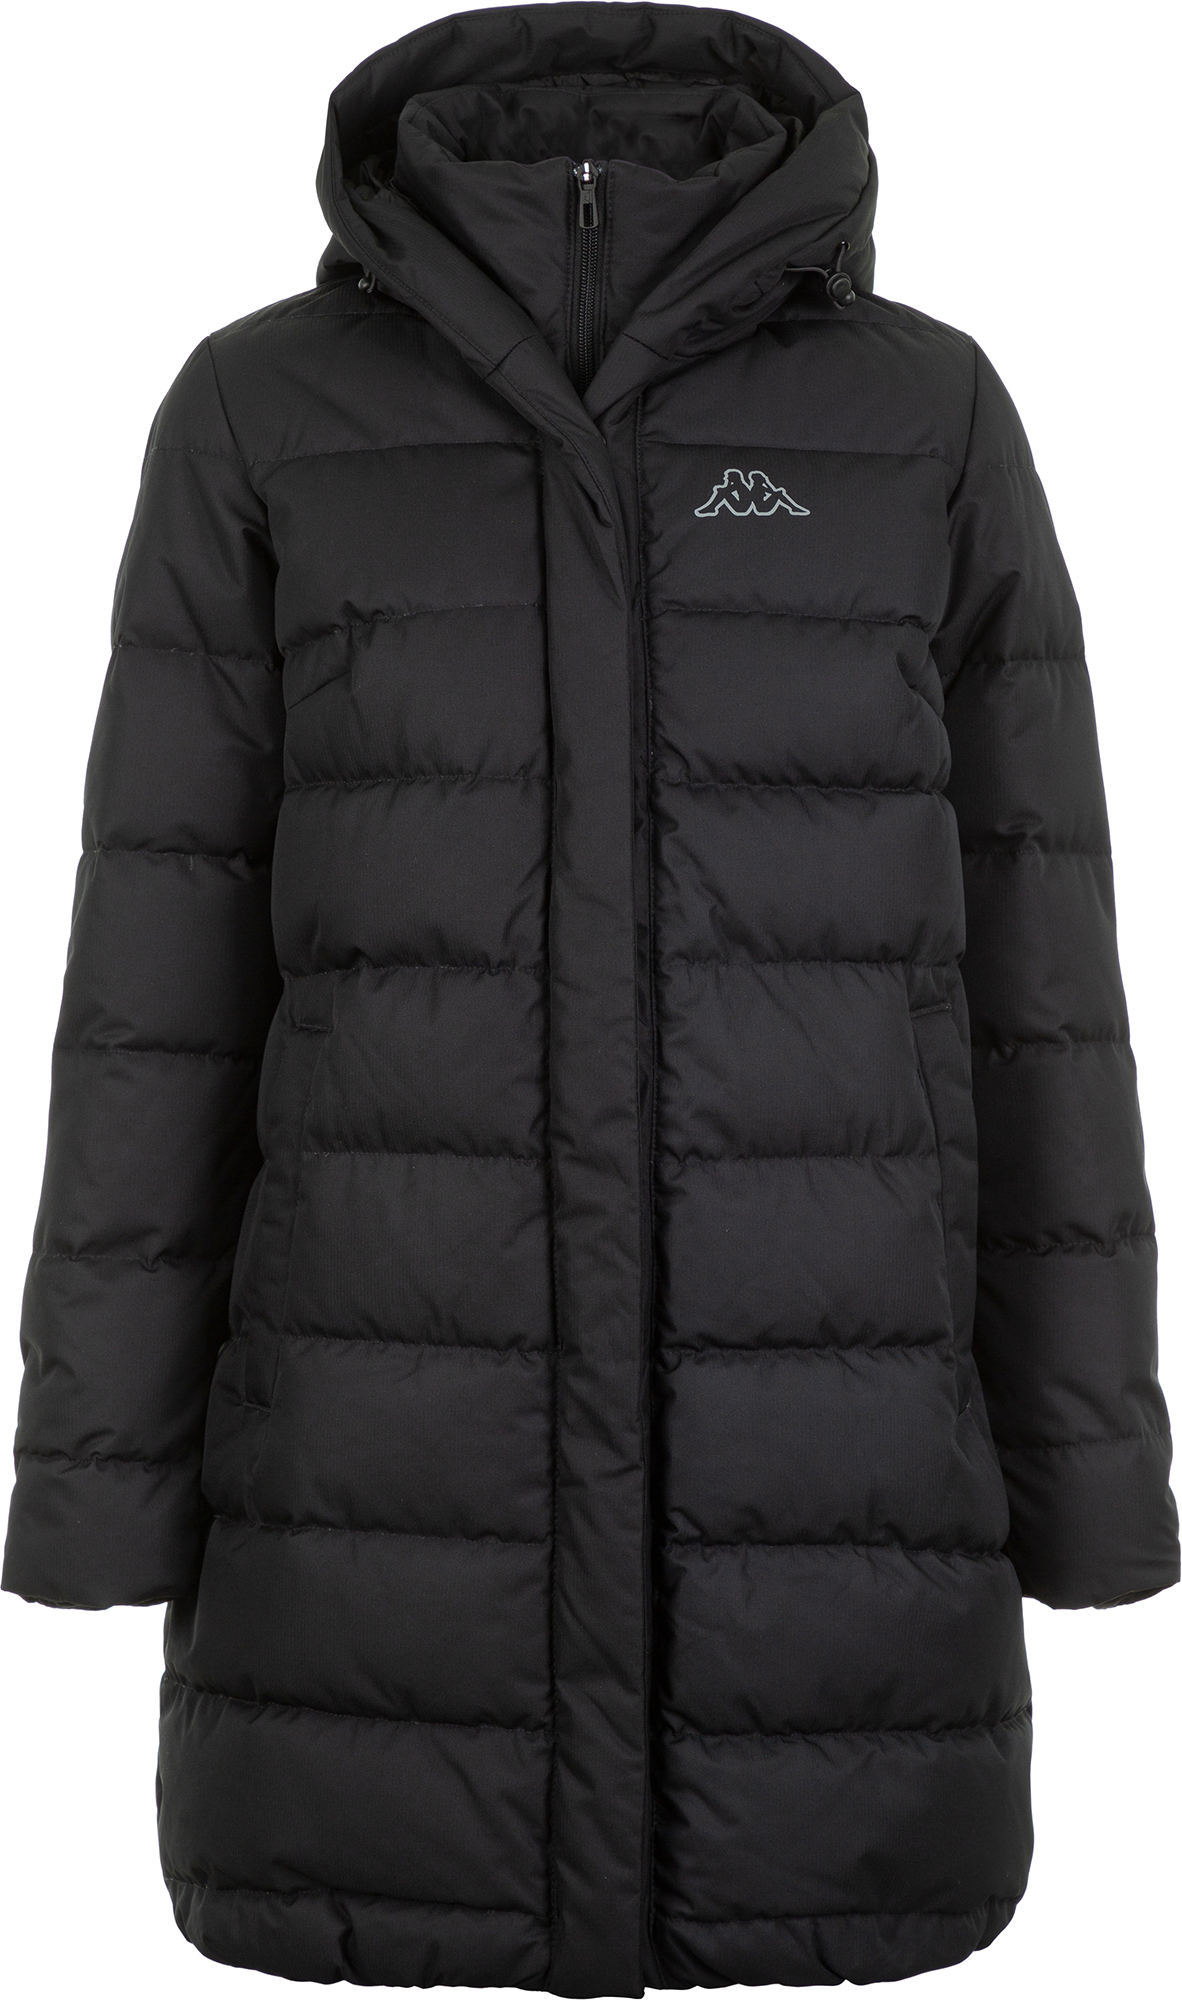 Фото - Kappa Куртка пуховая женская Kappa, размер 44 куртка женская pepe jeans цвет зеленый 097 pl401555 664 размер m 44 46